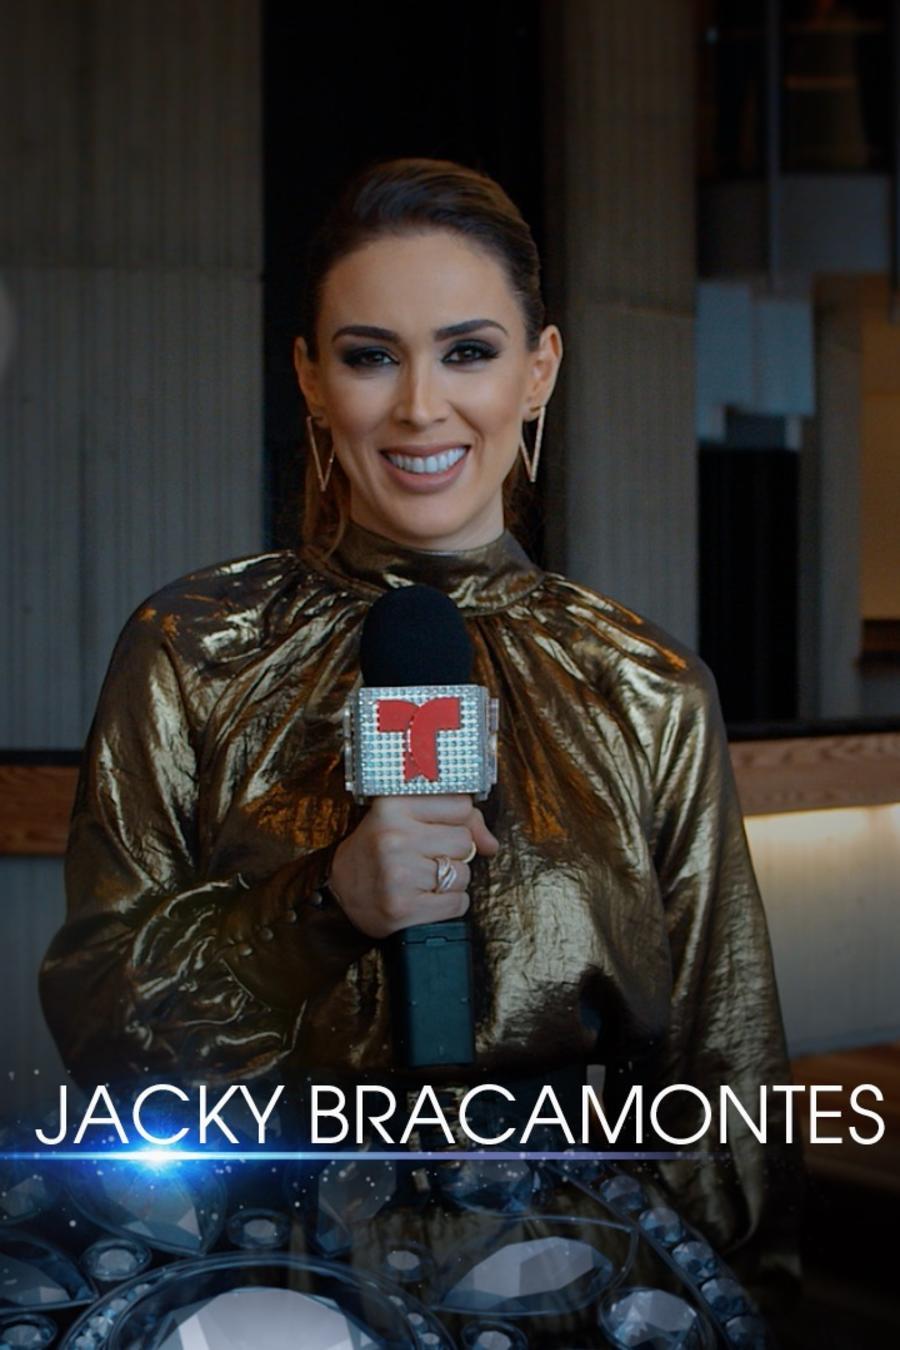 Jacky Bracamontes en Miss Universo 2019